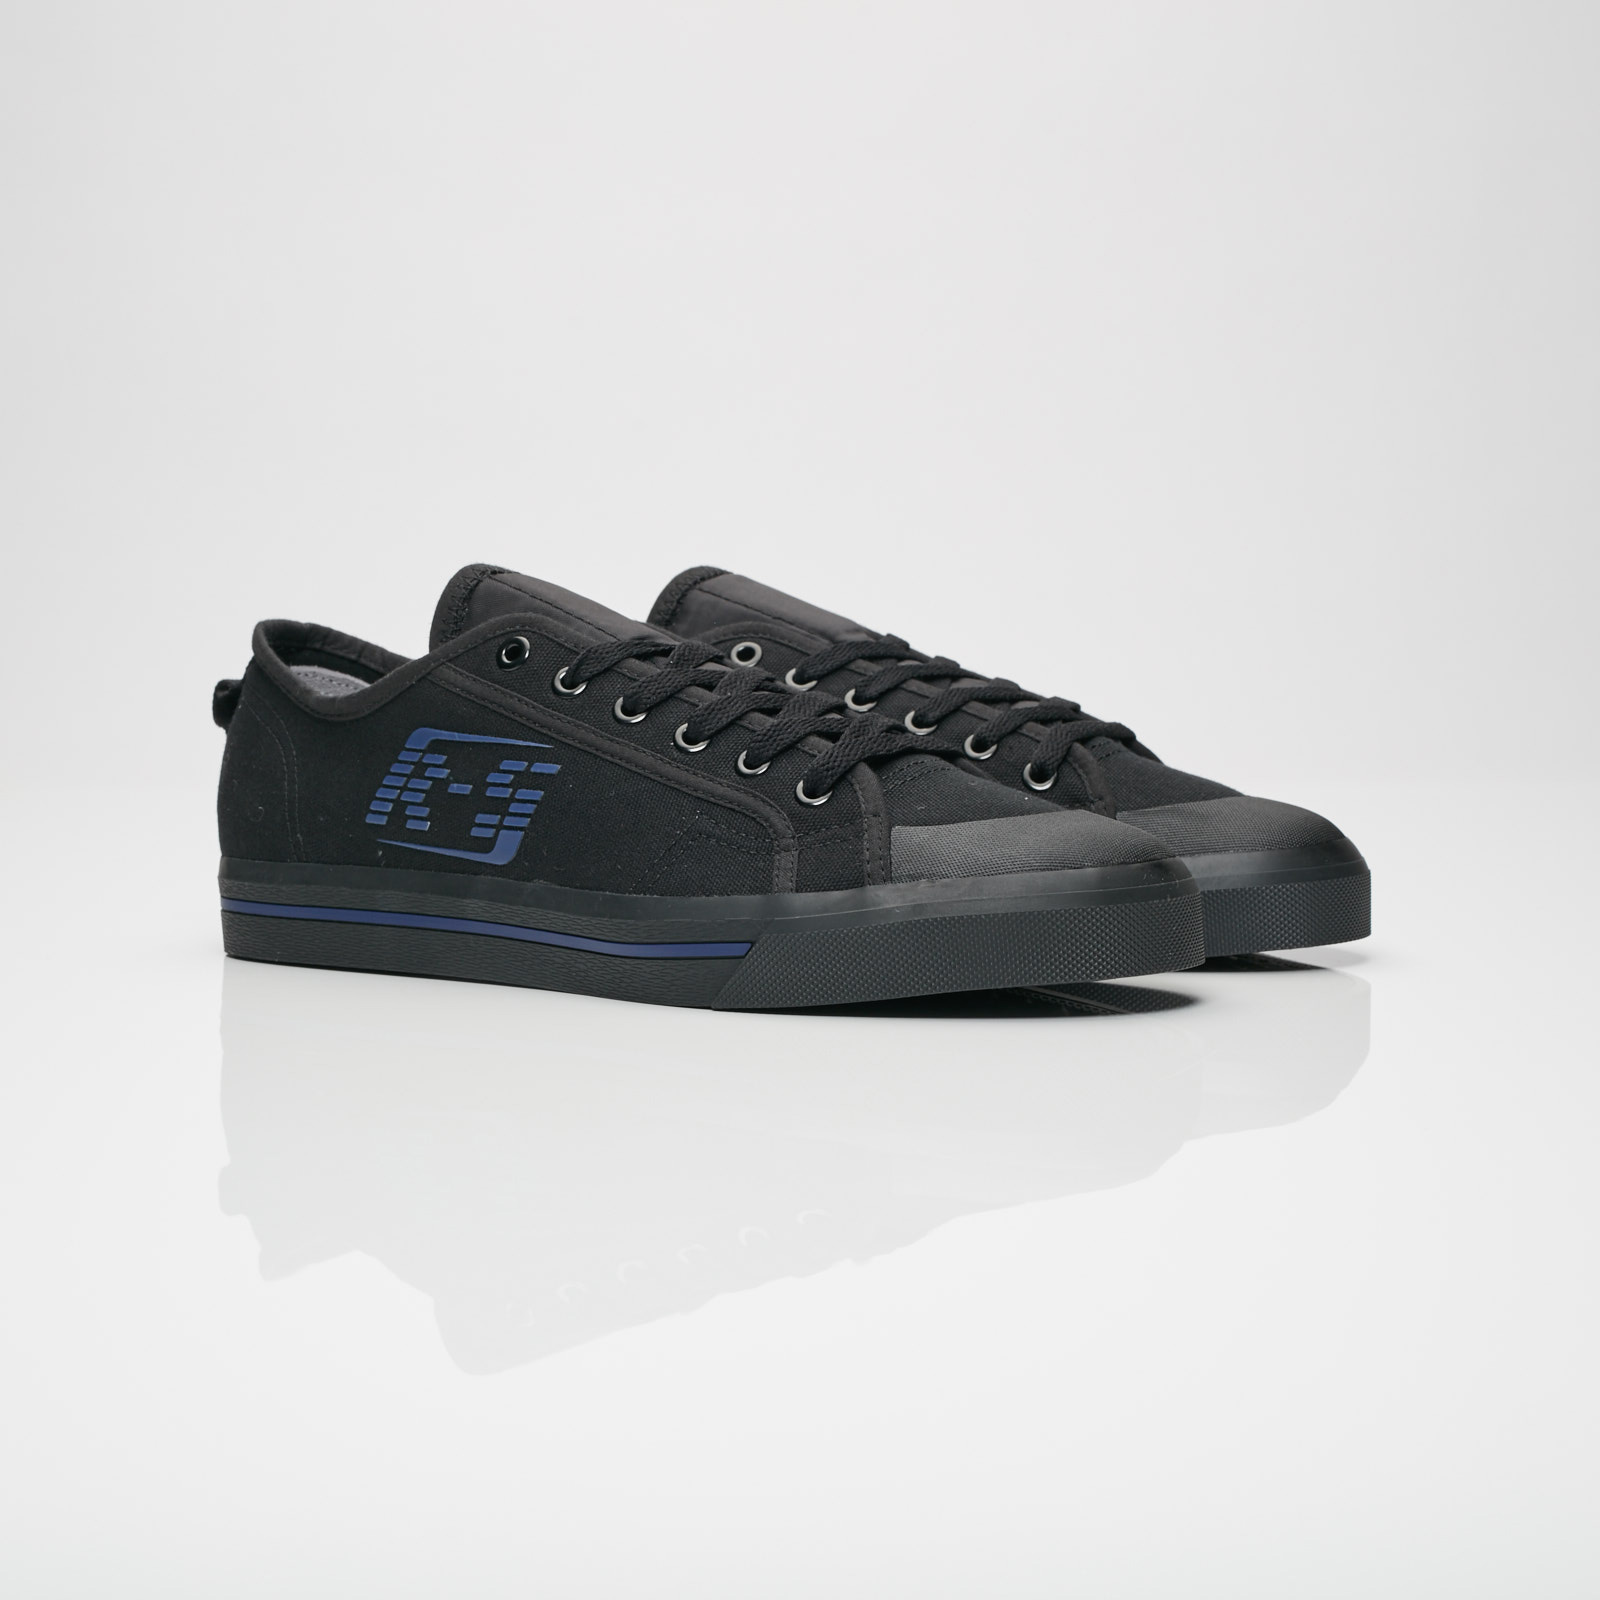 Converse Black & Yellow adidas Originals Edition Spirit Low Sneakers nEcU67